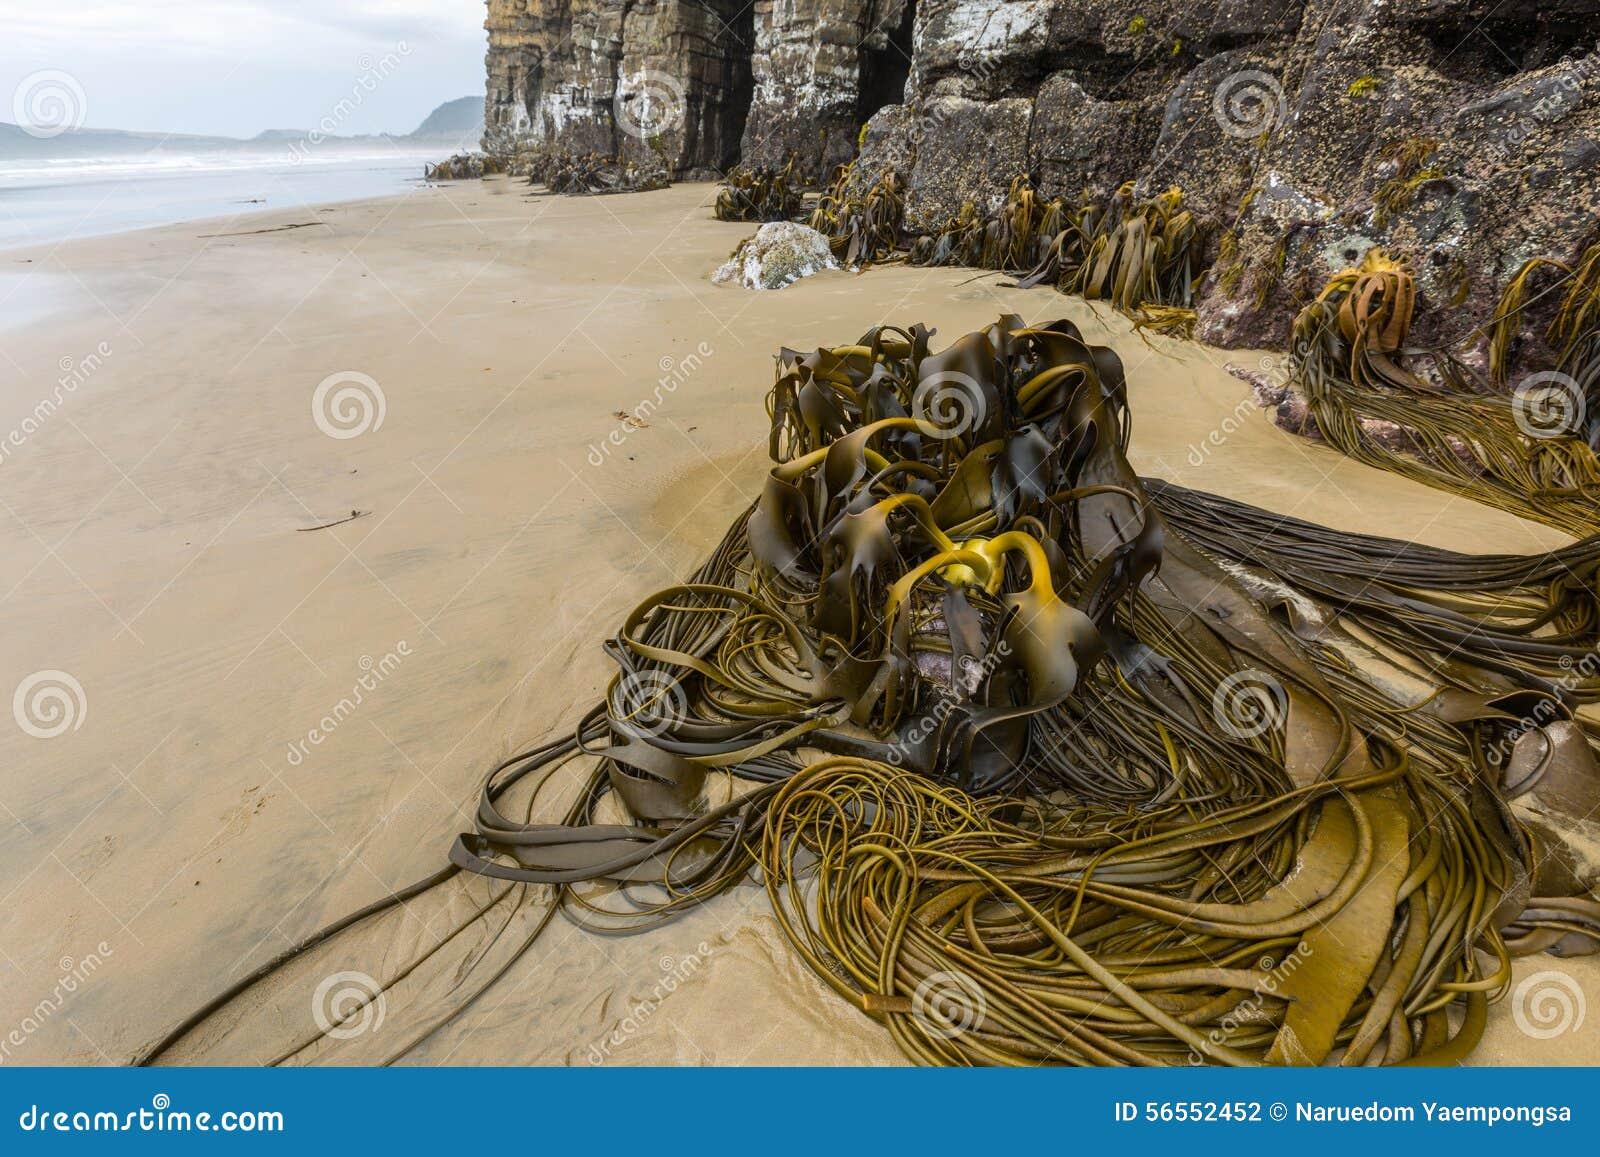 Download Σπηλιές καθεδρικών ναών, Catlins, νότιο νησί, Νέα Ζηλανδία Στοκ Εικόνες - εικόνα από μορφές, θάλασσα: 56552452